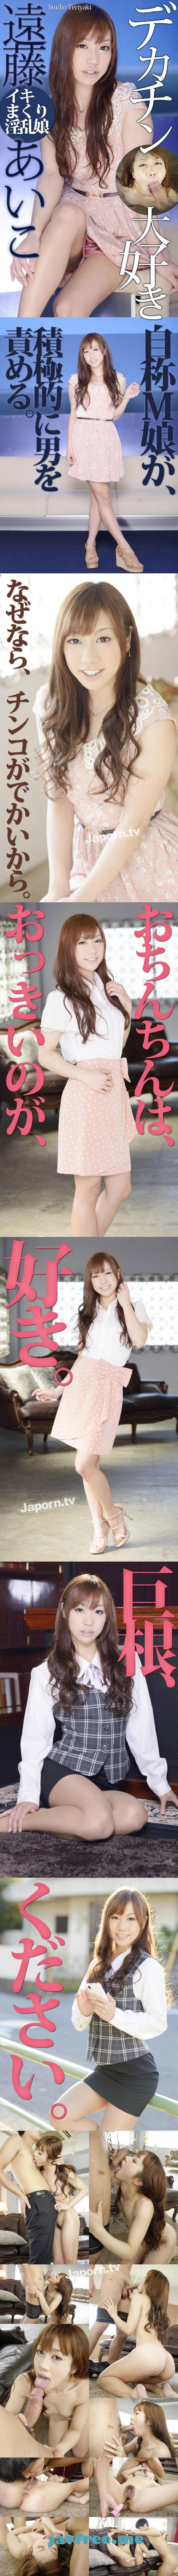 [PT 122] Model Collection : 遠藤あいこ 遠藤あいこ PT Aiko Endo